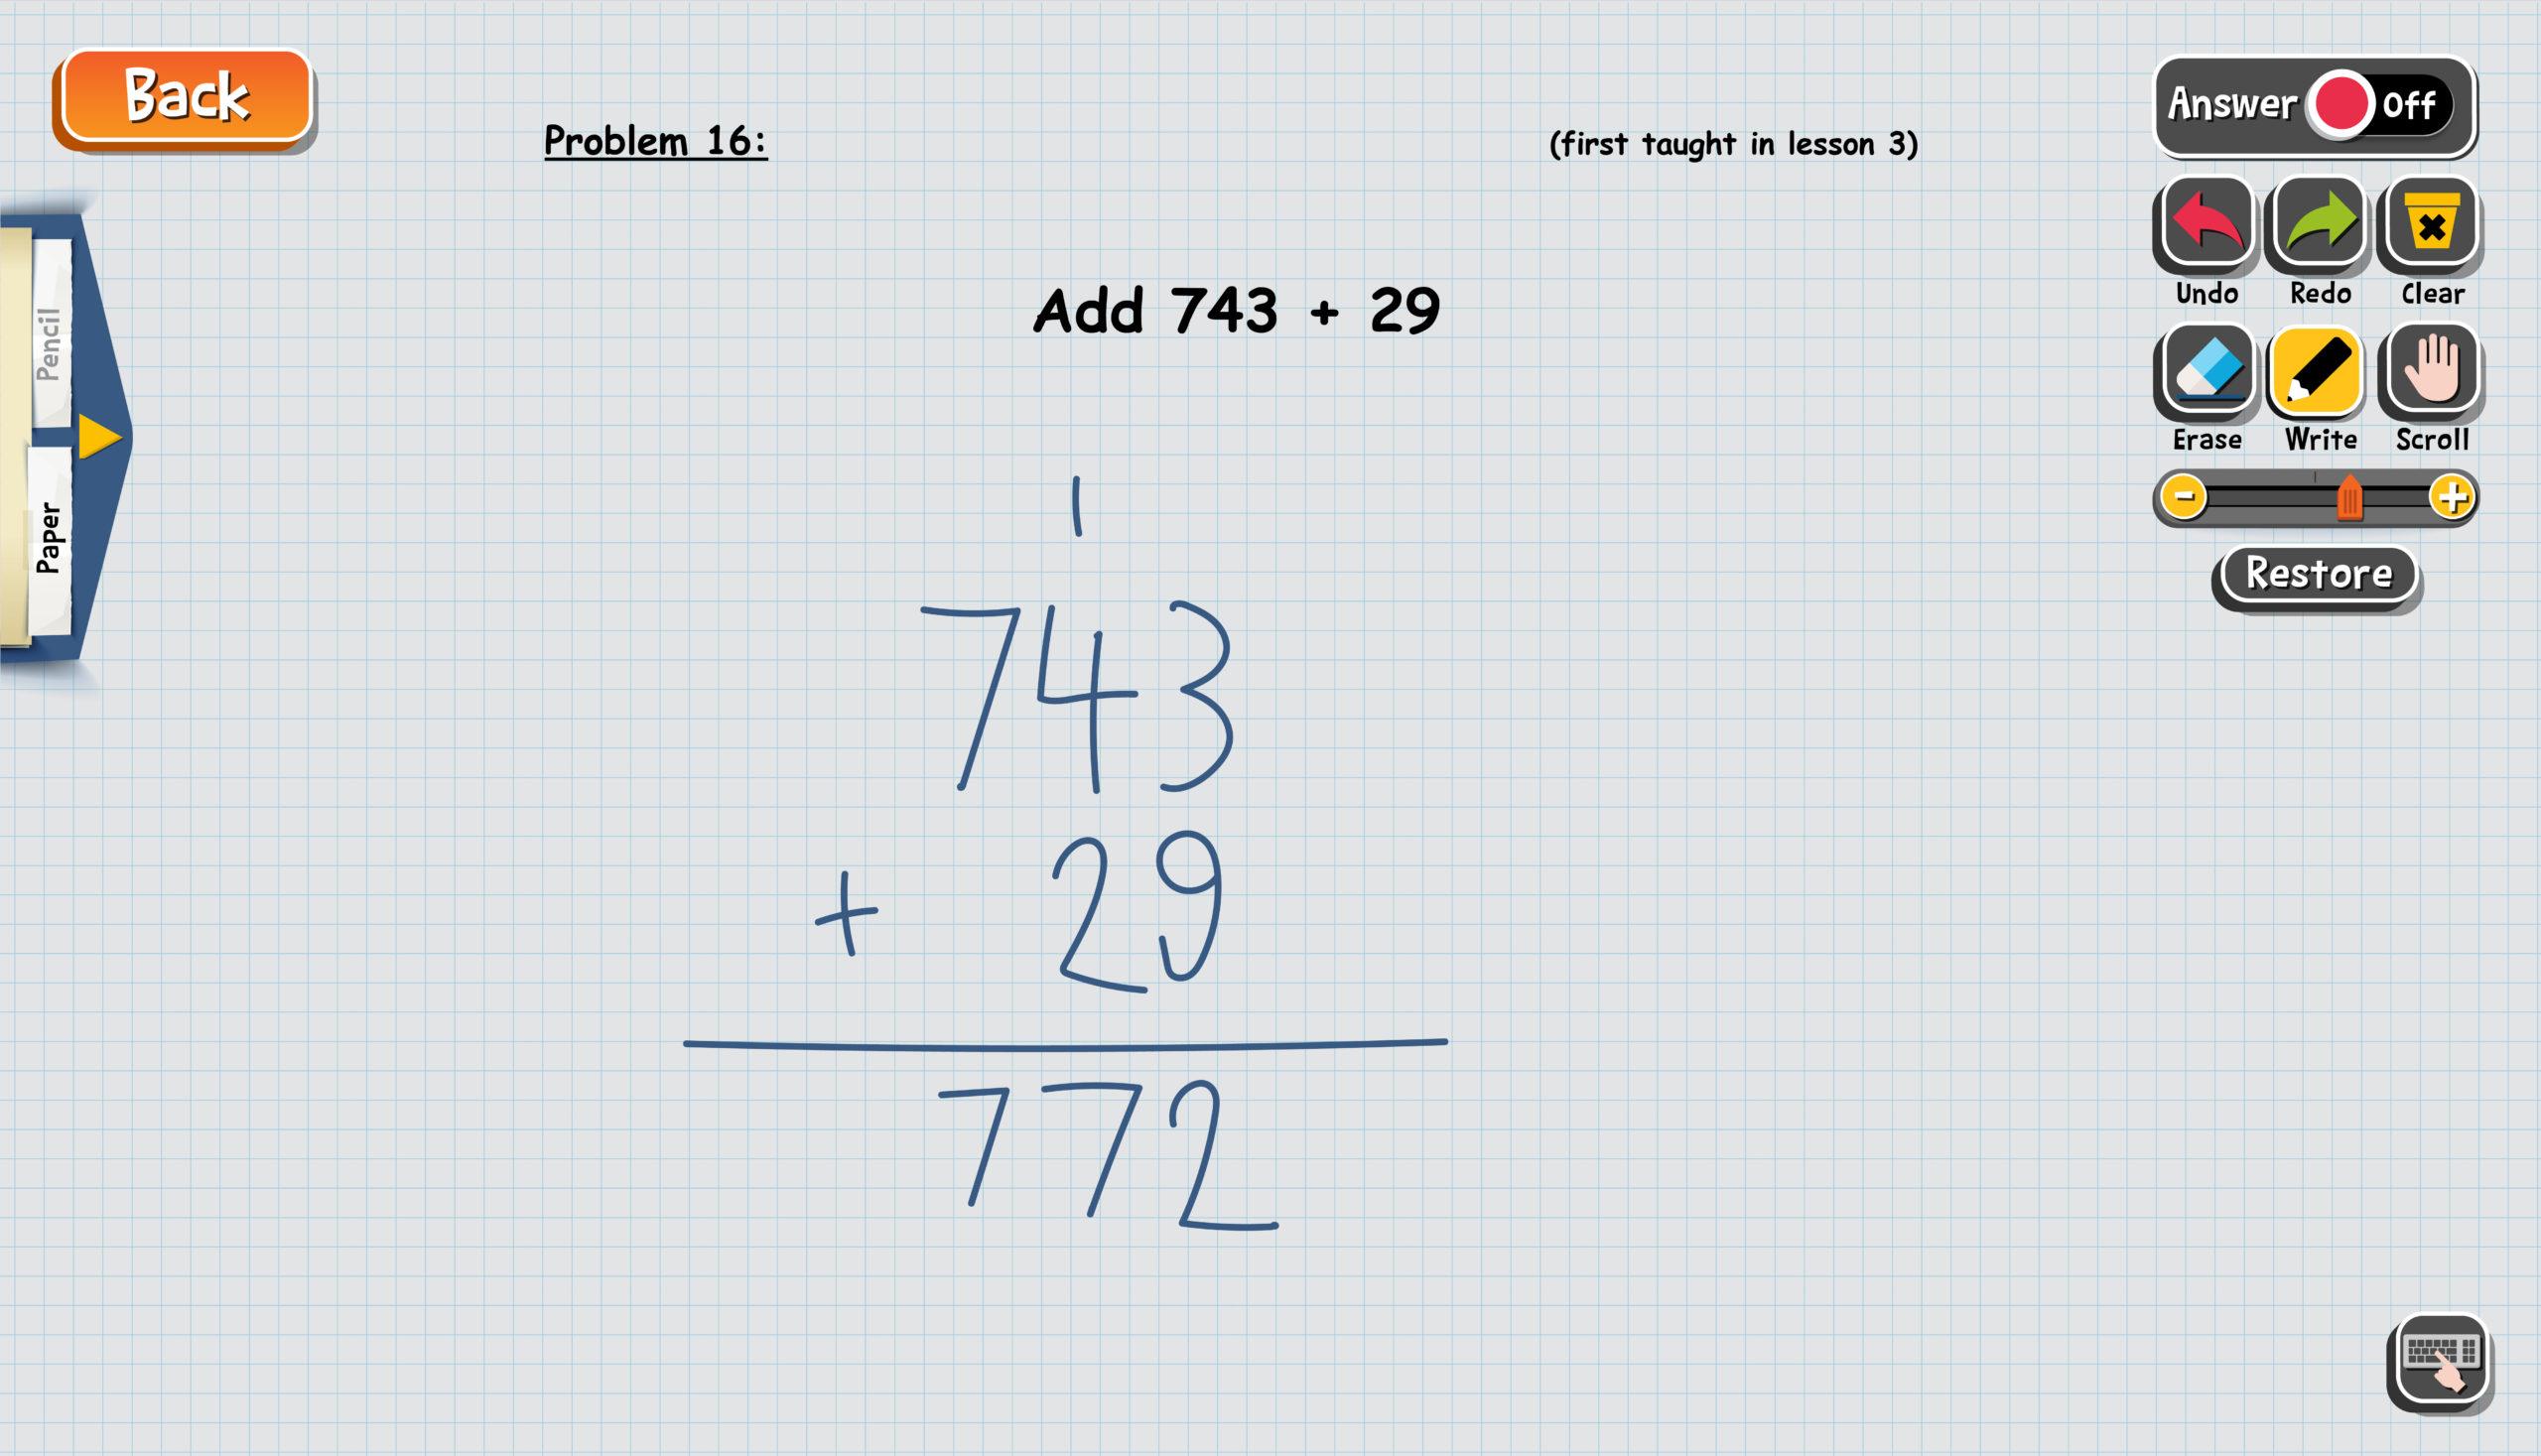 Screenshot of student scratch pad on Teaching Textbooks app